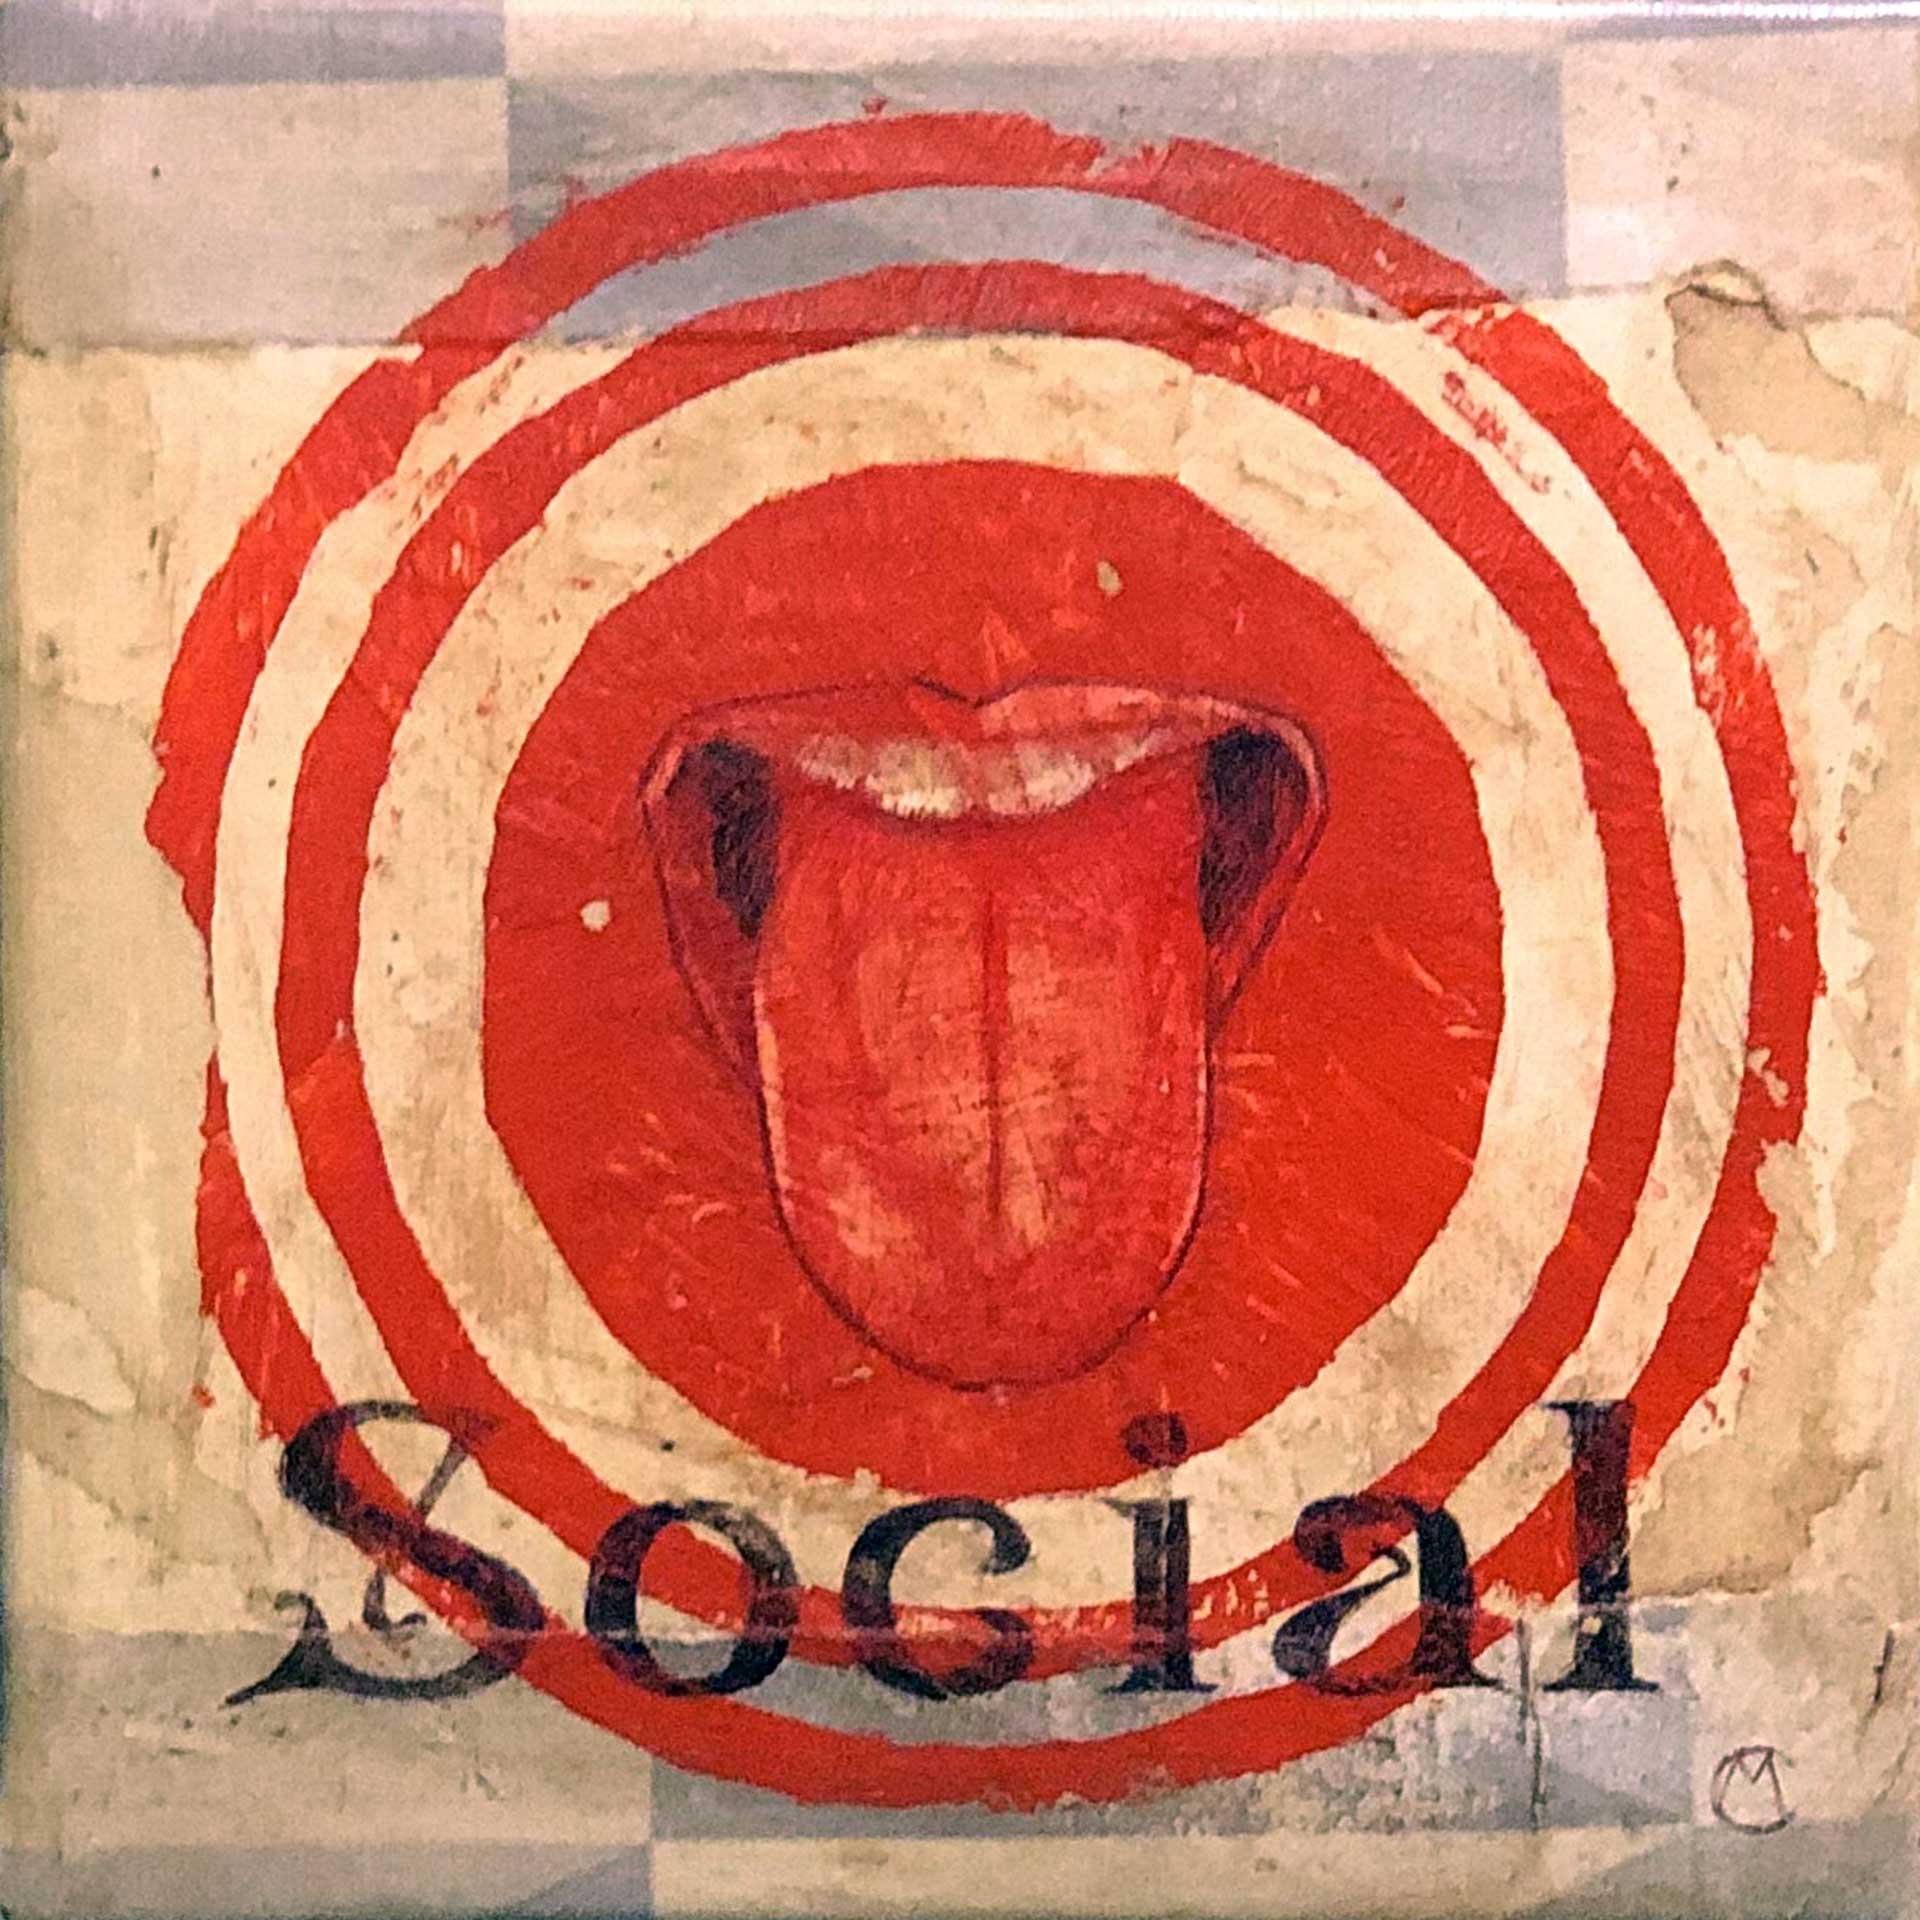 massimo corli – social